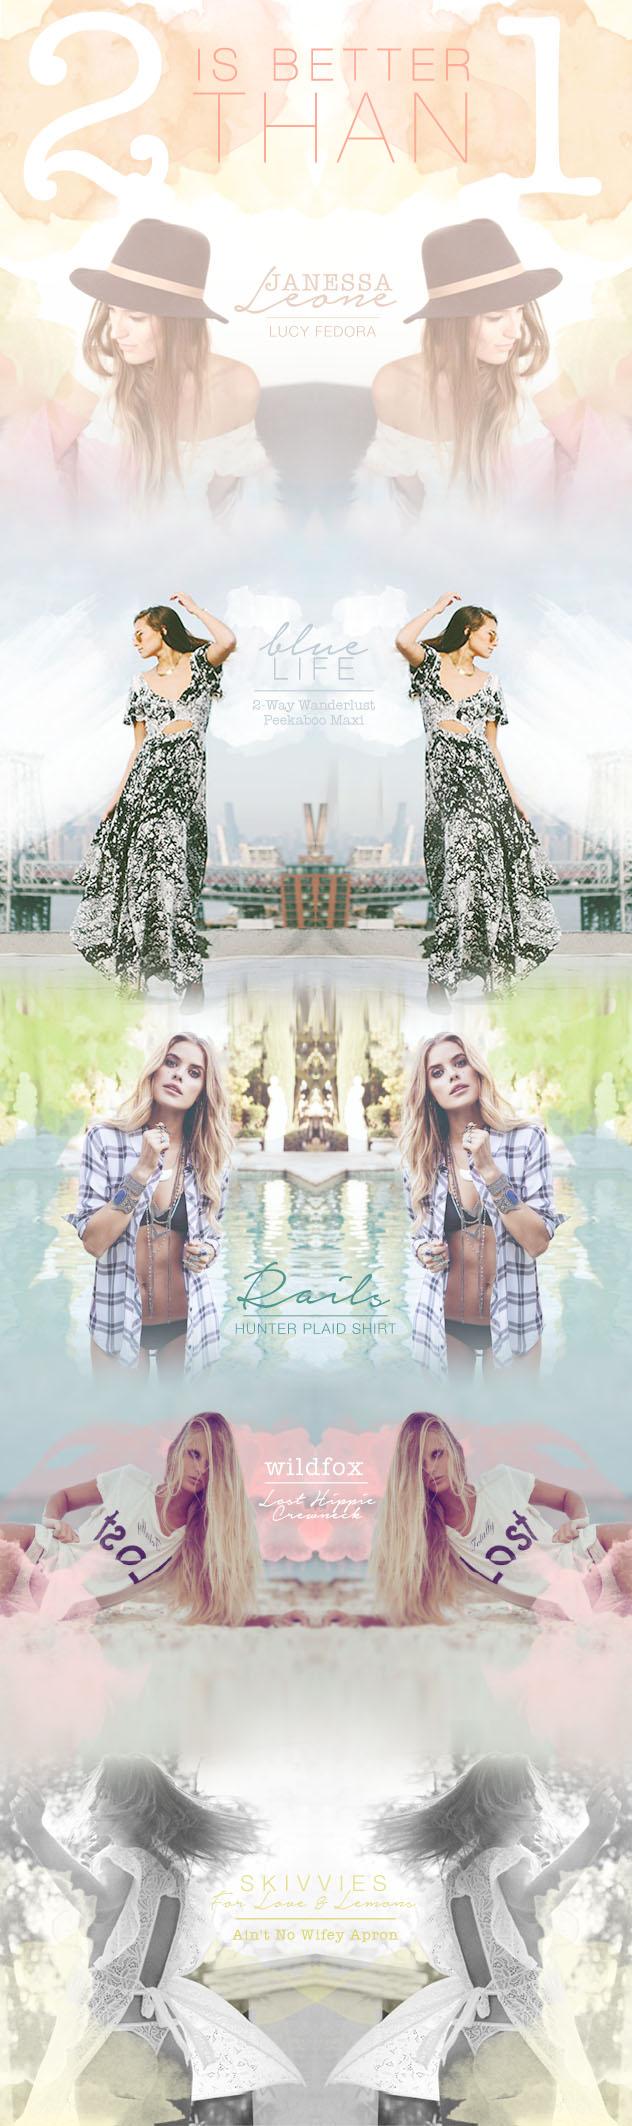 3_31blogpost_Twins